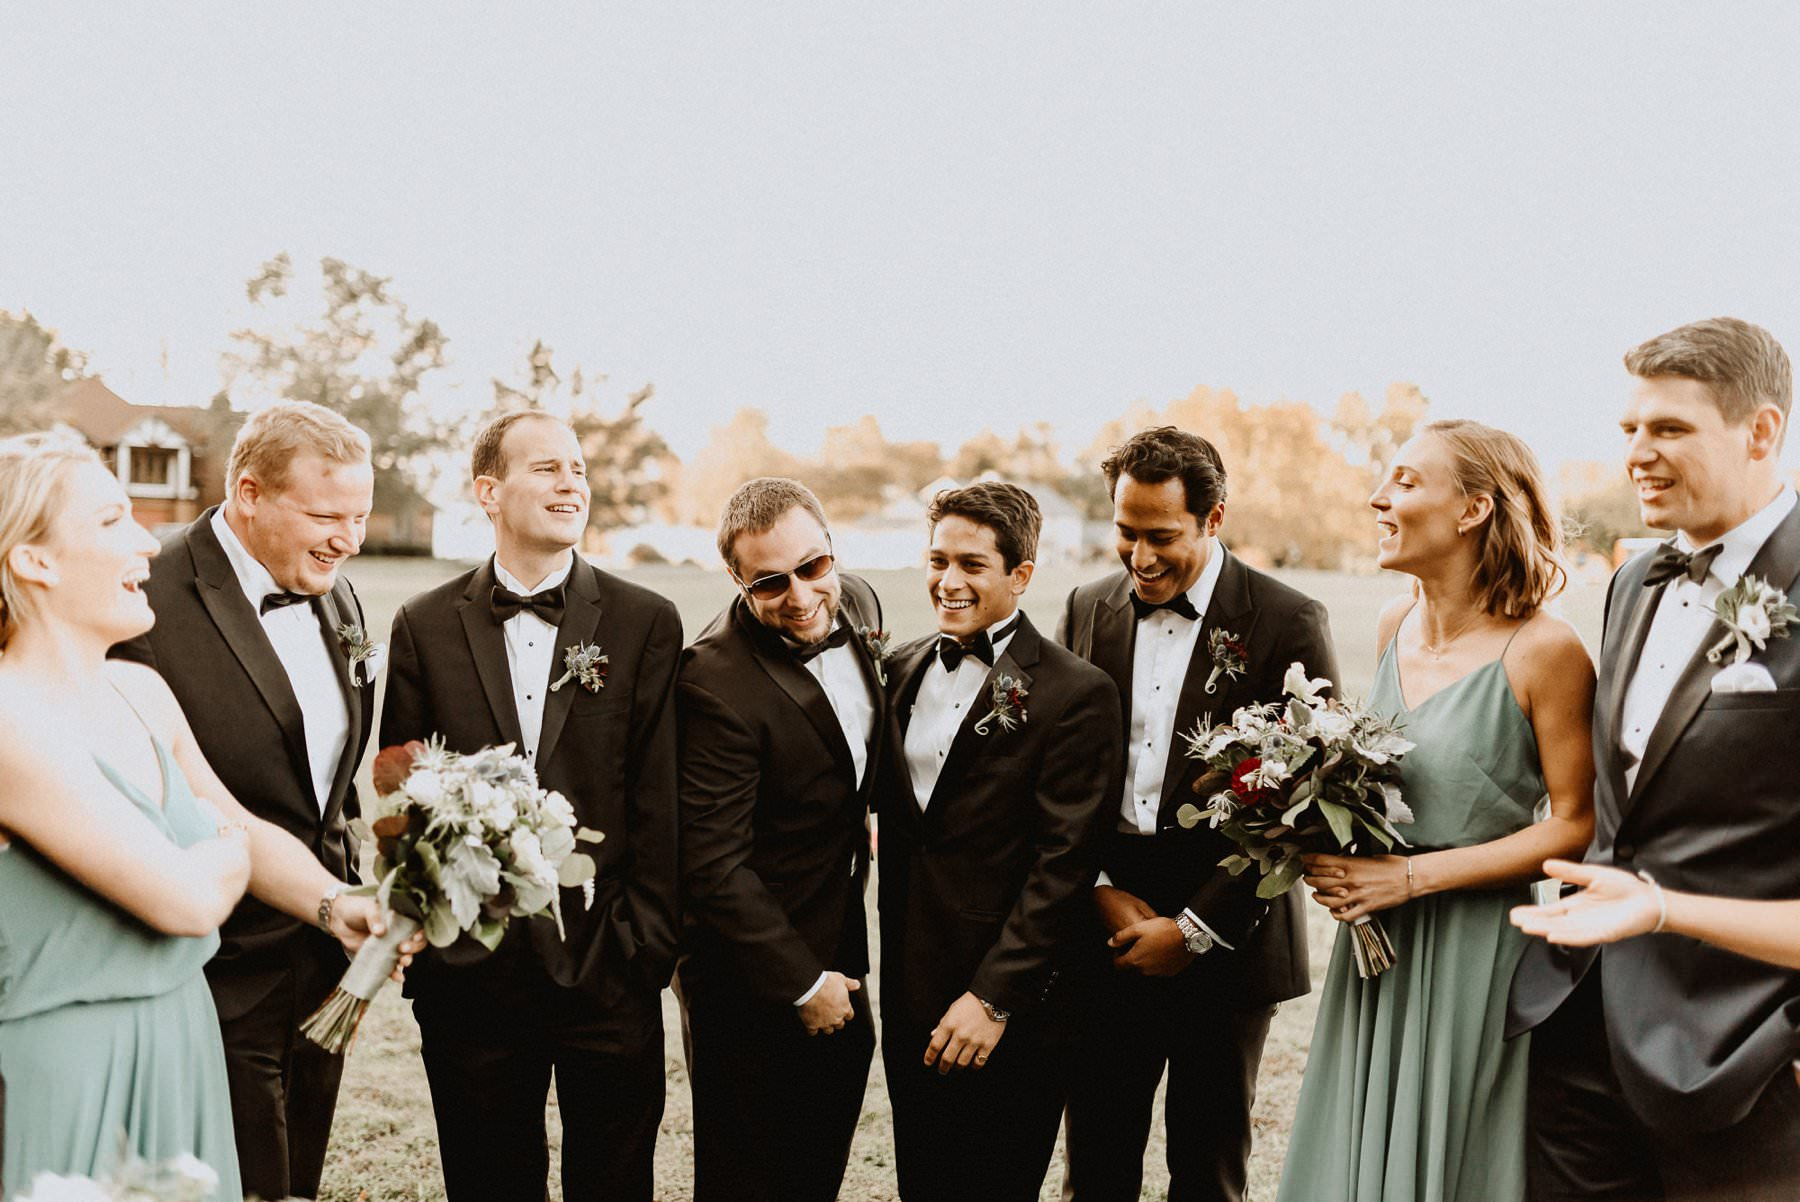 Philadelphia_private_estate_wedding-059.jpg